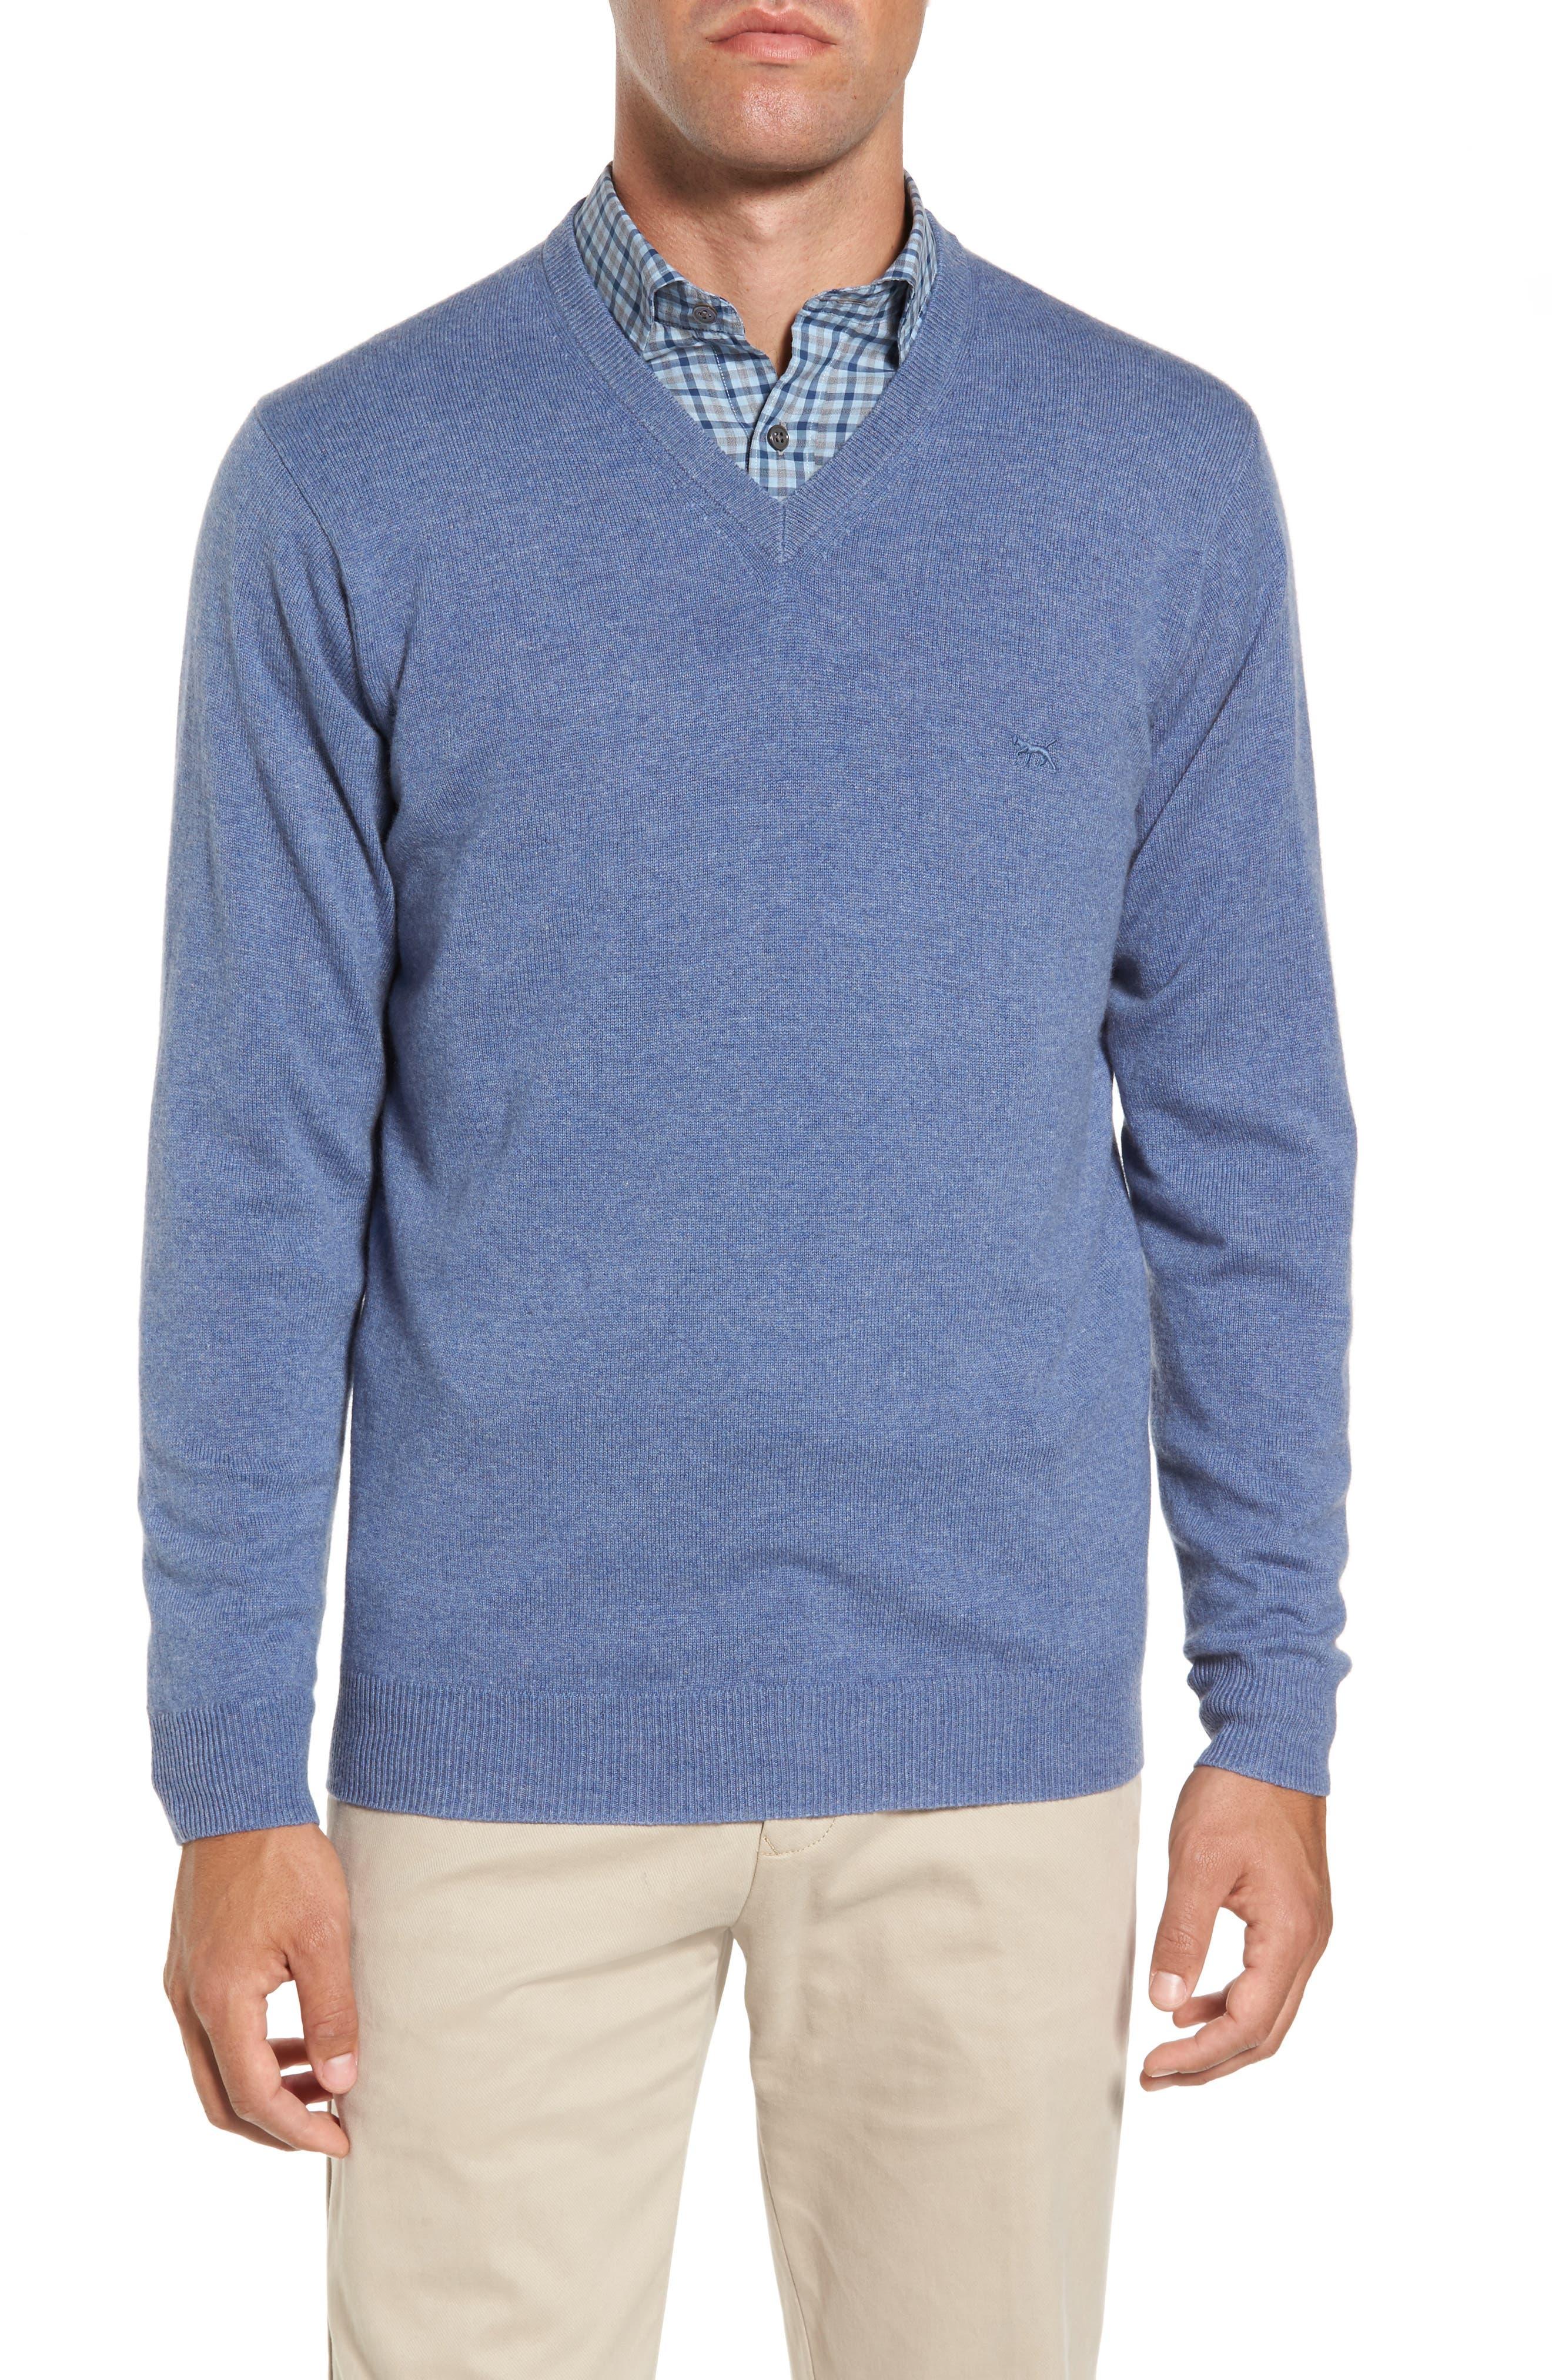 'Inchbonnie' Wool & Cashmere V-Neck Sweater,                         Main,                         color, Bluestone